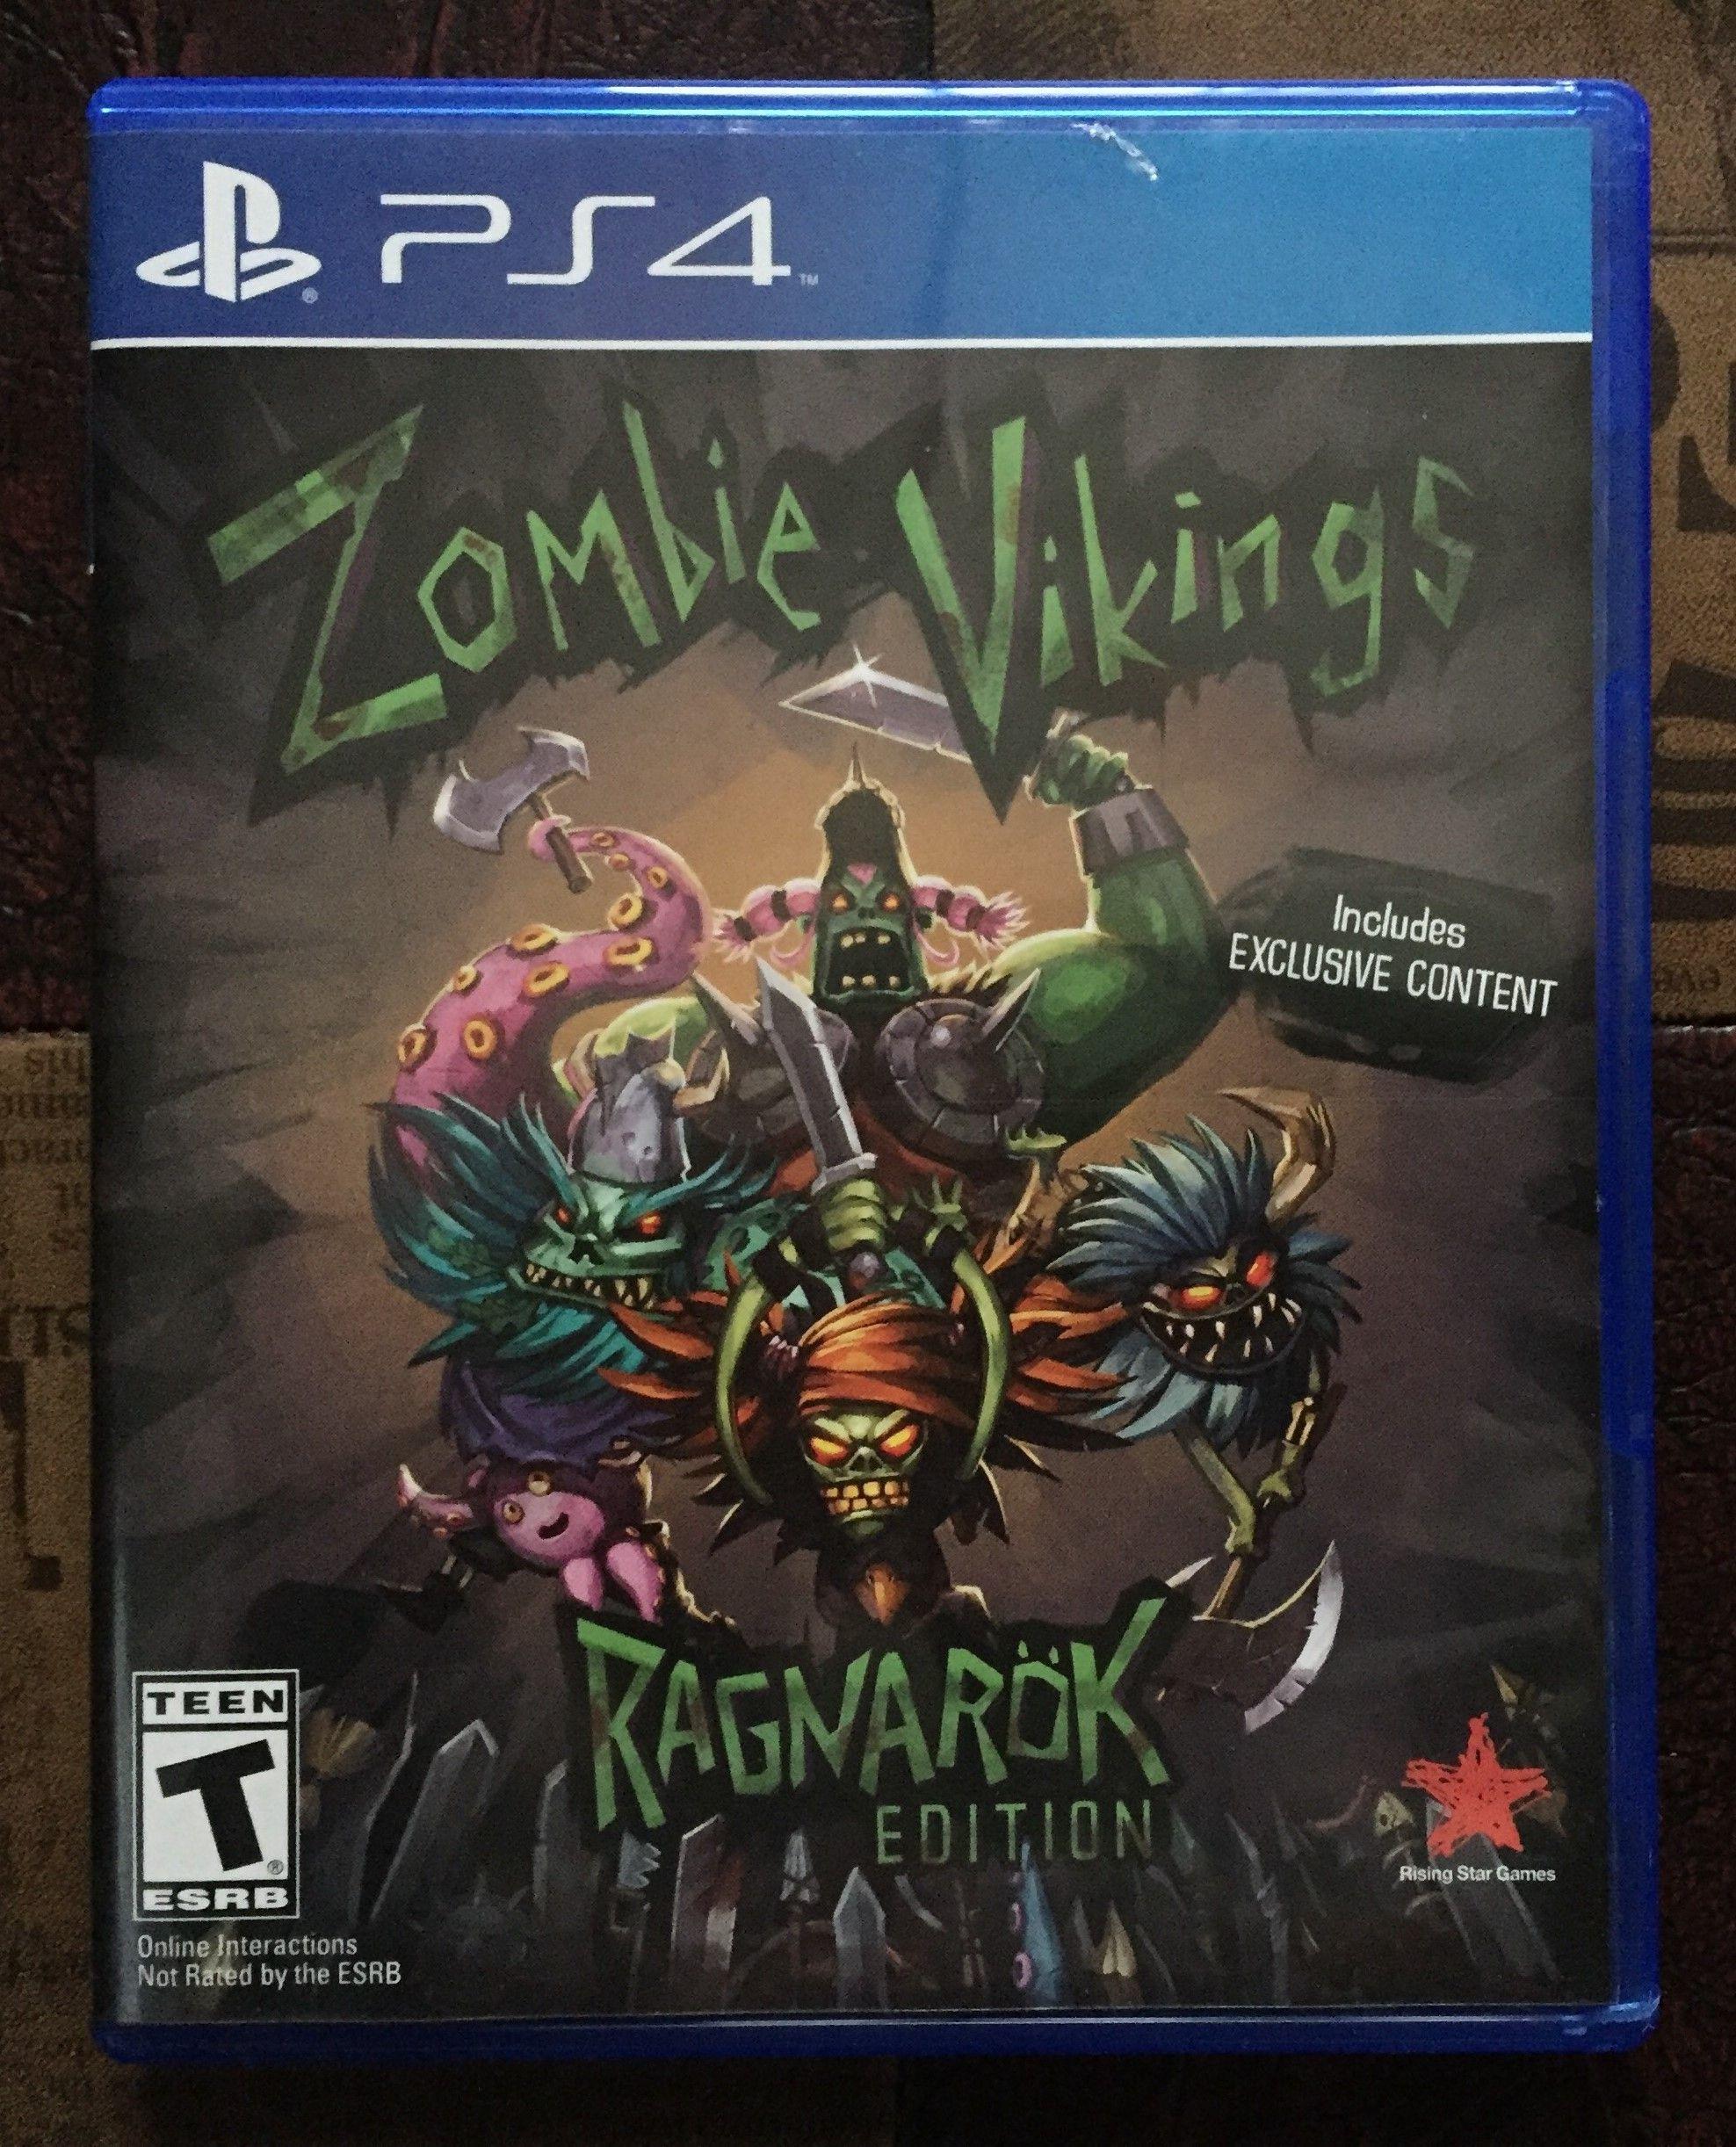 Zombie Vikings Ragnarok Edition PS4 Ps4 games